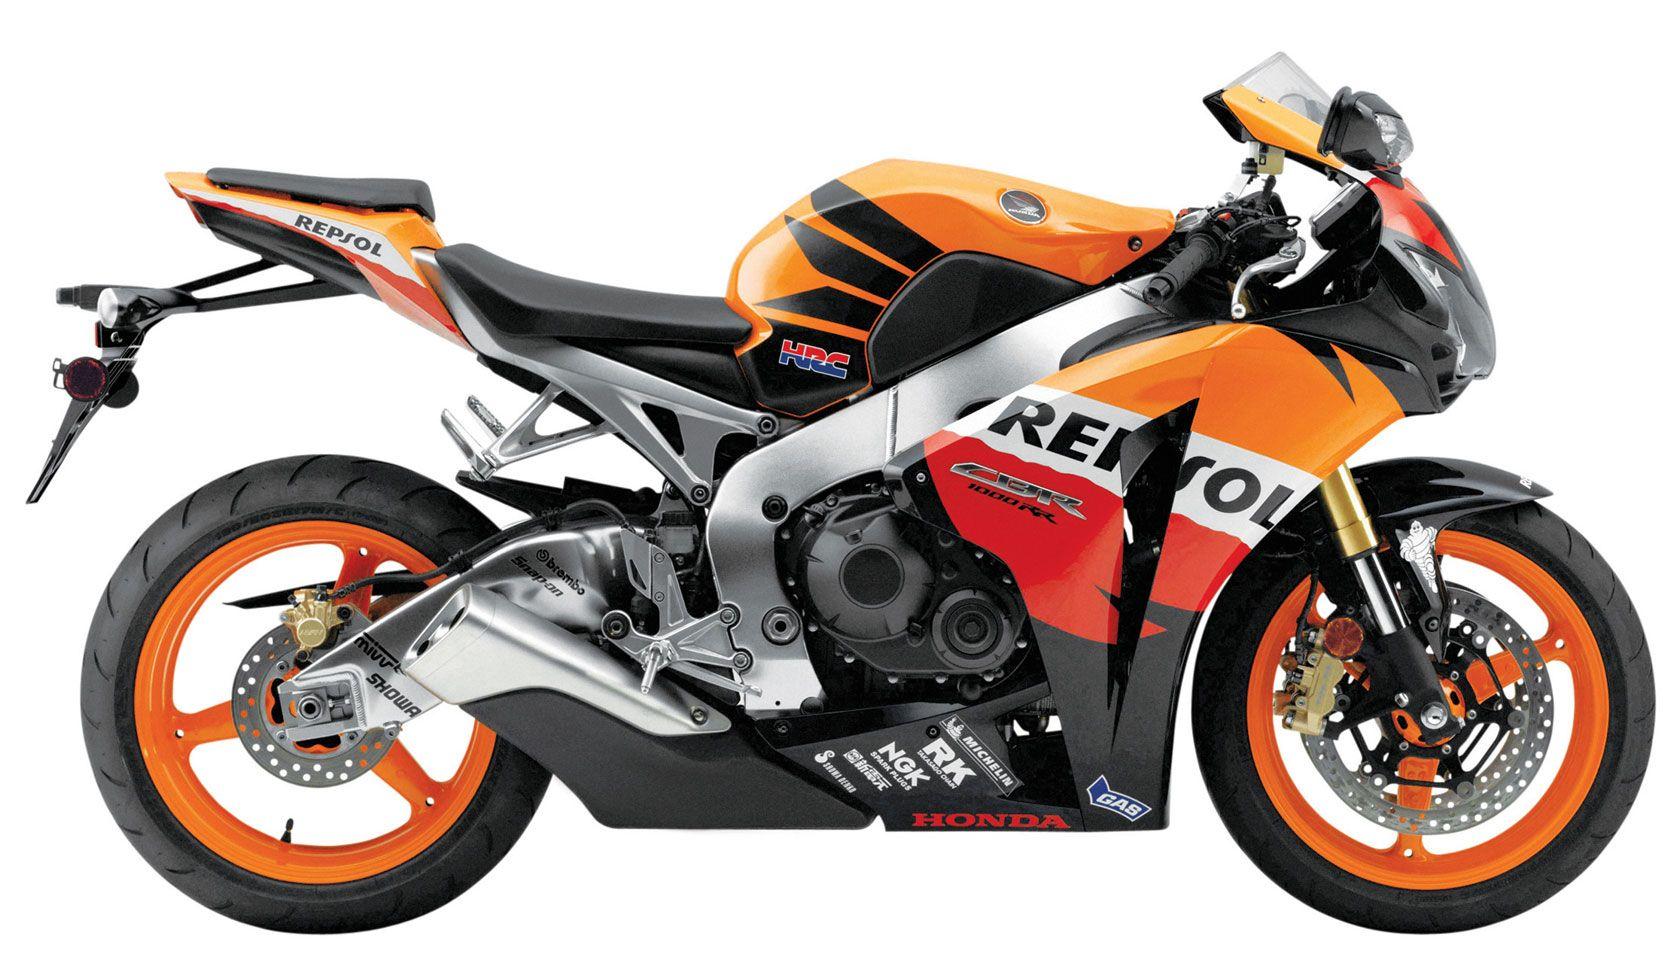 Black And Orange Cbr1000rr Google Search Motos Esportivas Honda Super Bikes Honda Cbr1000rr